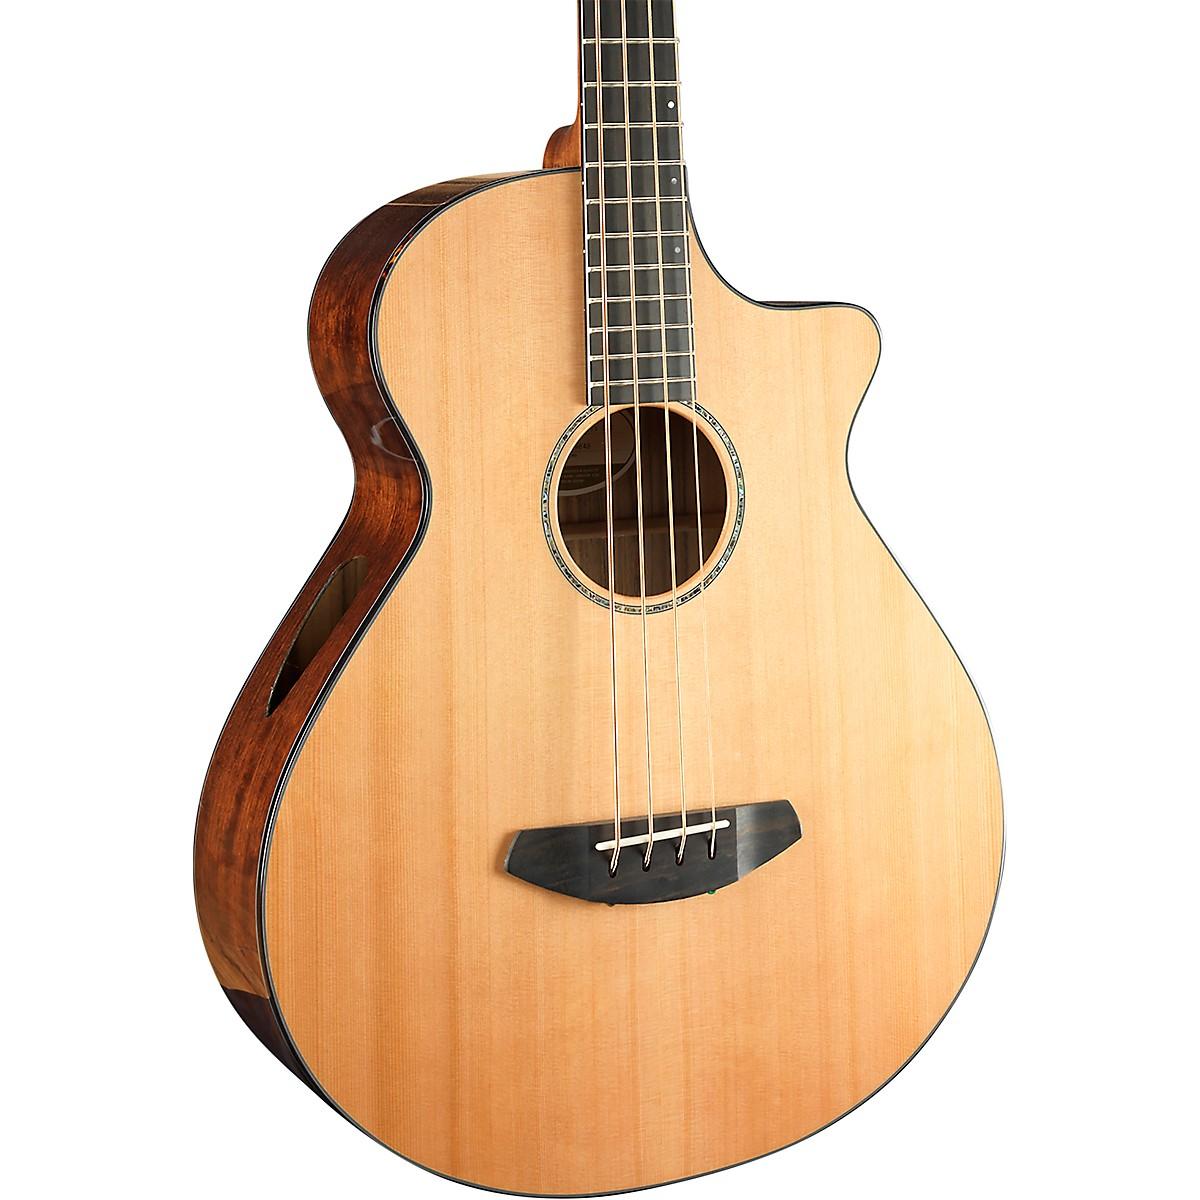 Breedlove Solo Jumbo Cutaway CE Acoustic-Electric Bass Guitar